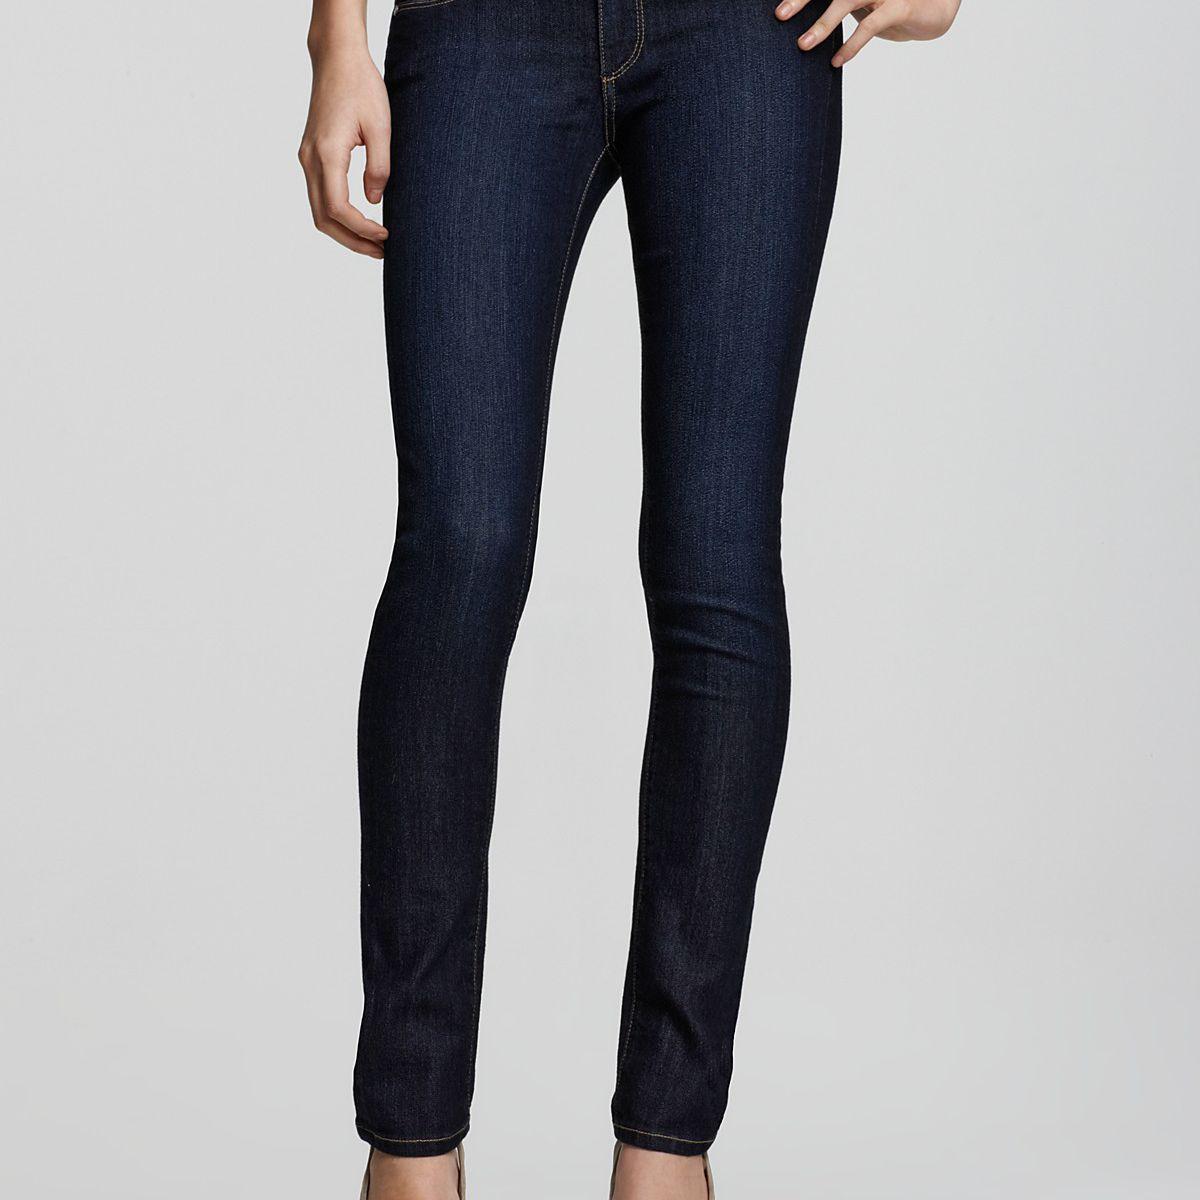 Paige petite designer jeans in skinny fit